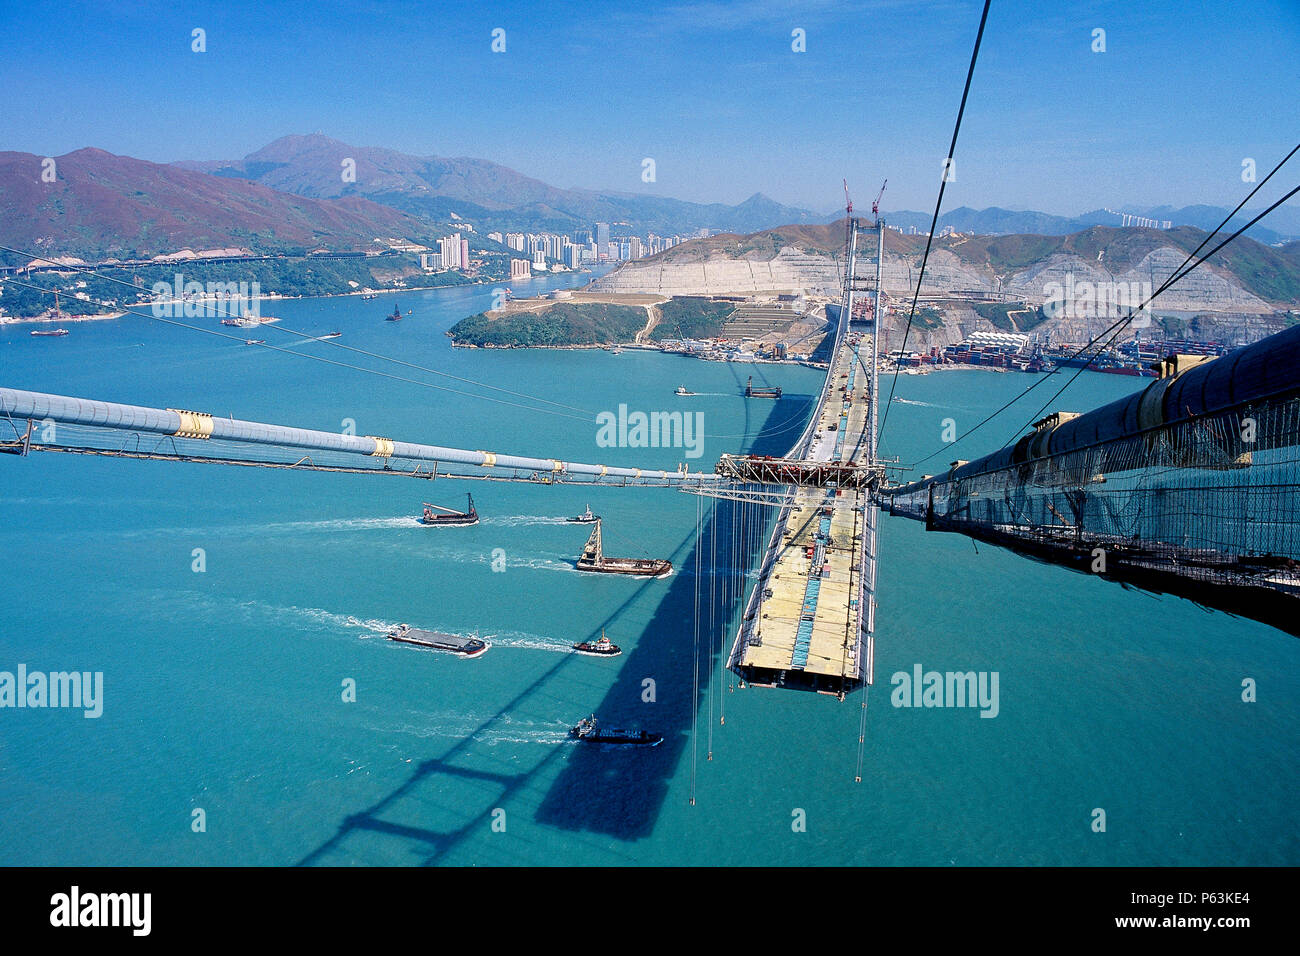 Tsing Ma suspension bridge. China. Constructed to link Hong Kong with Chek Lap Kok airport. - Stock Image